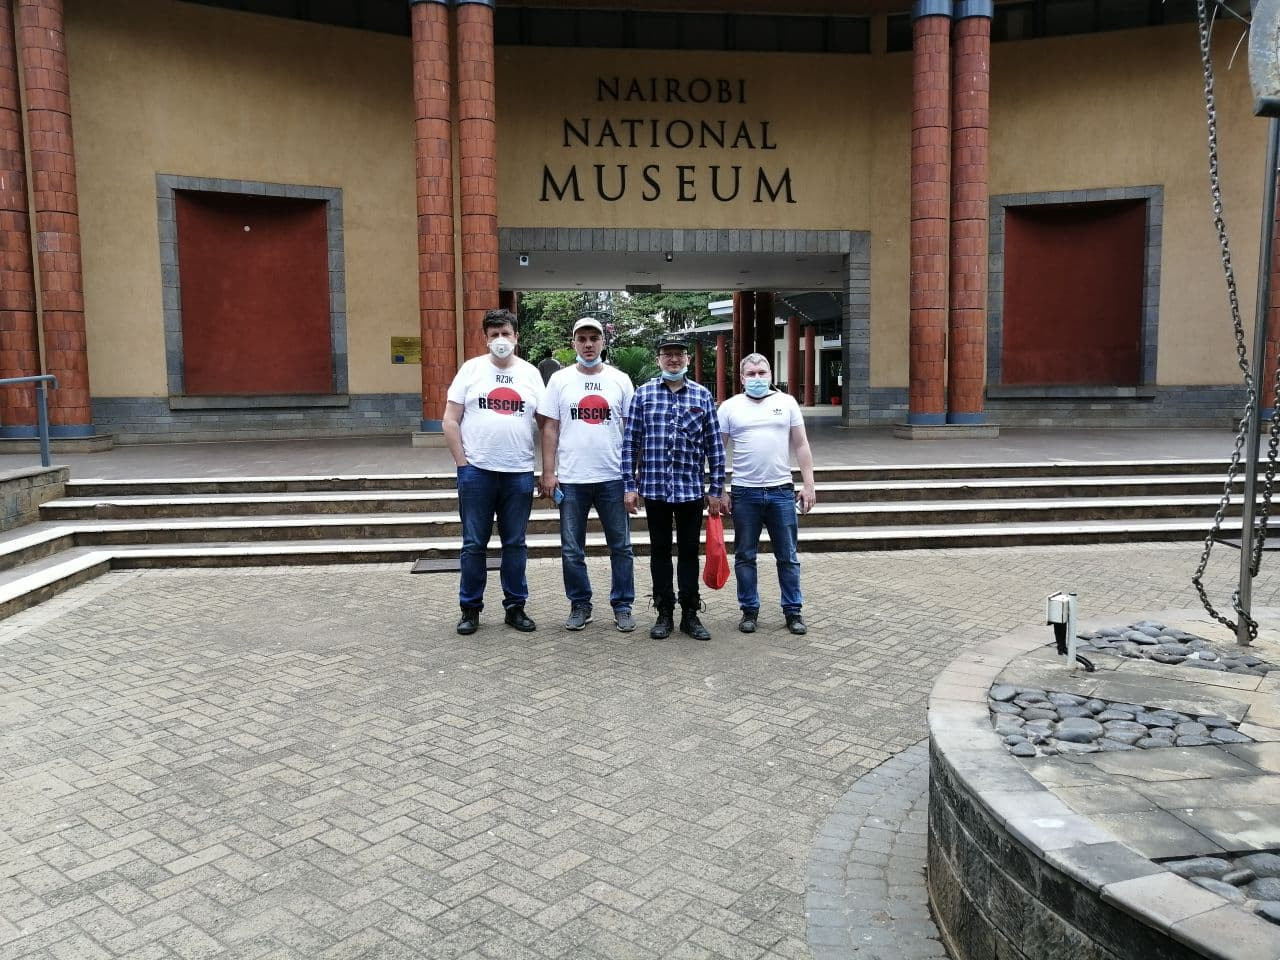 7Q7RU National Museum Nairobi, Kenya Image 1